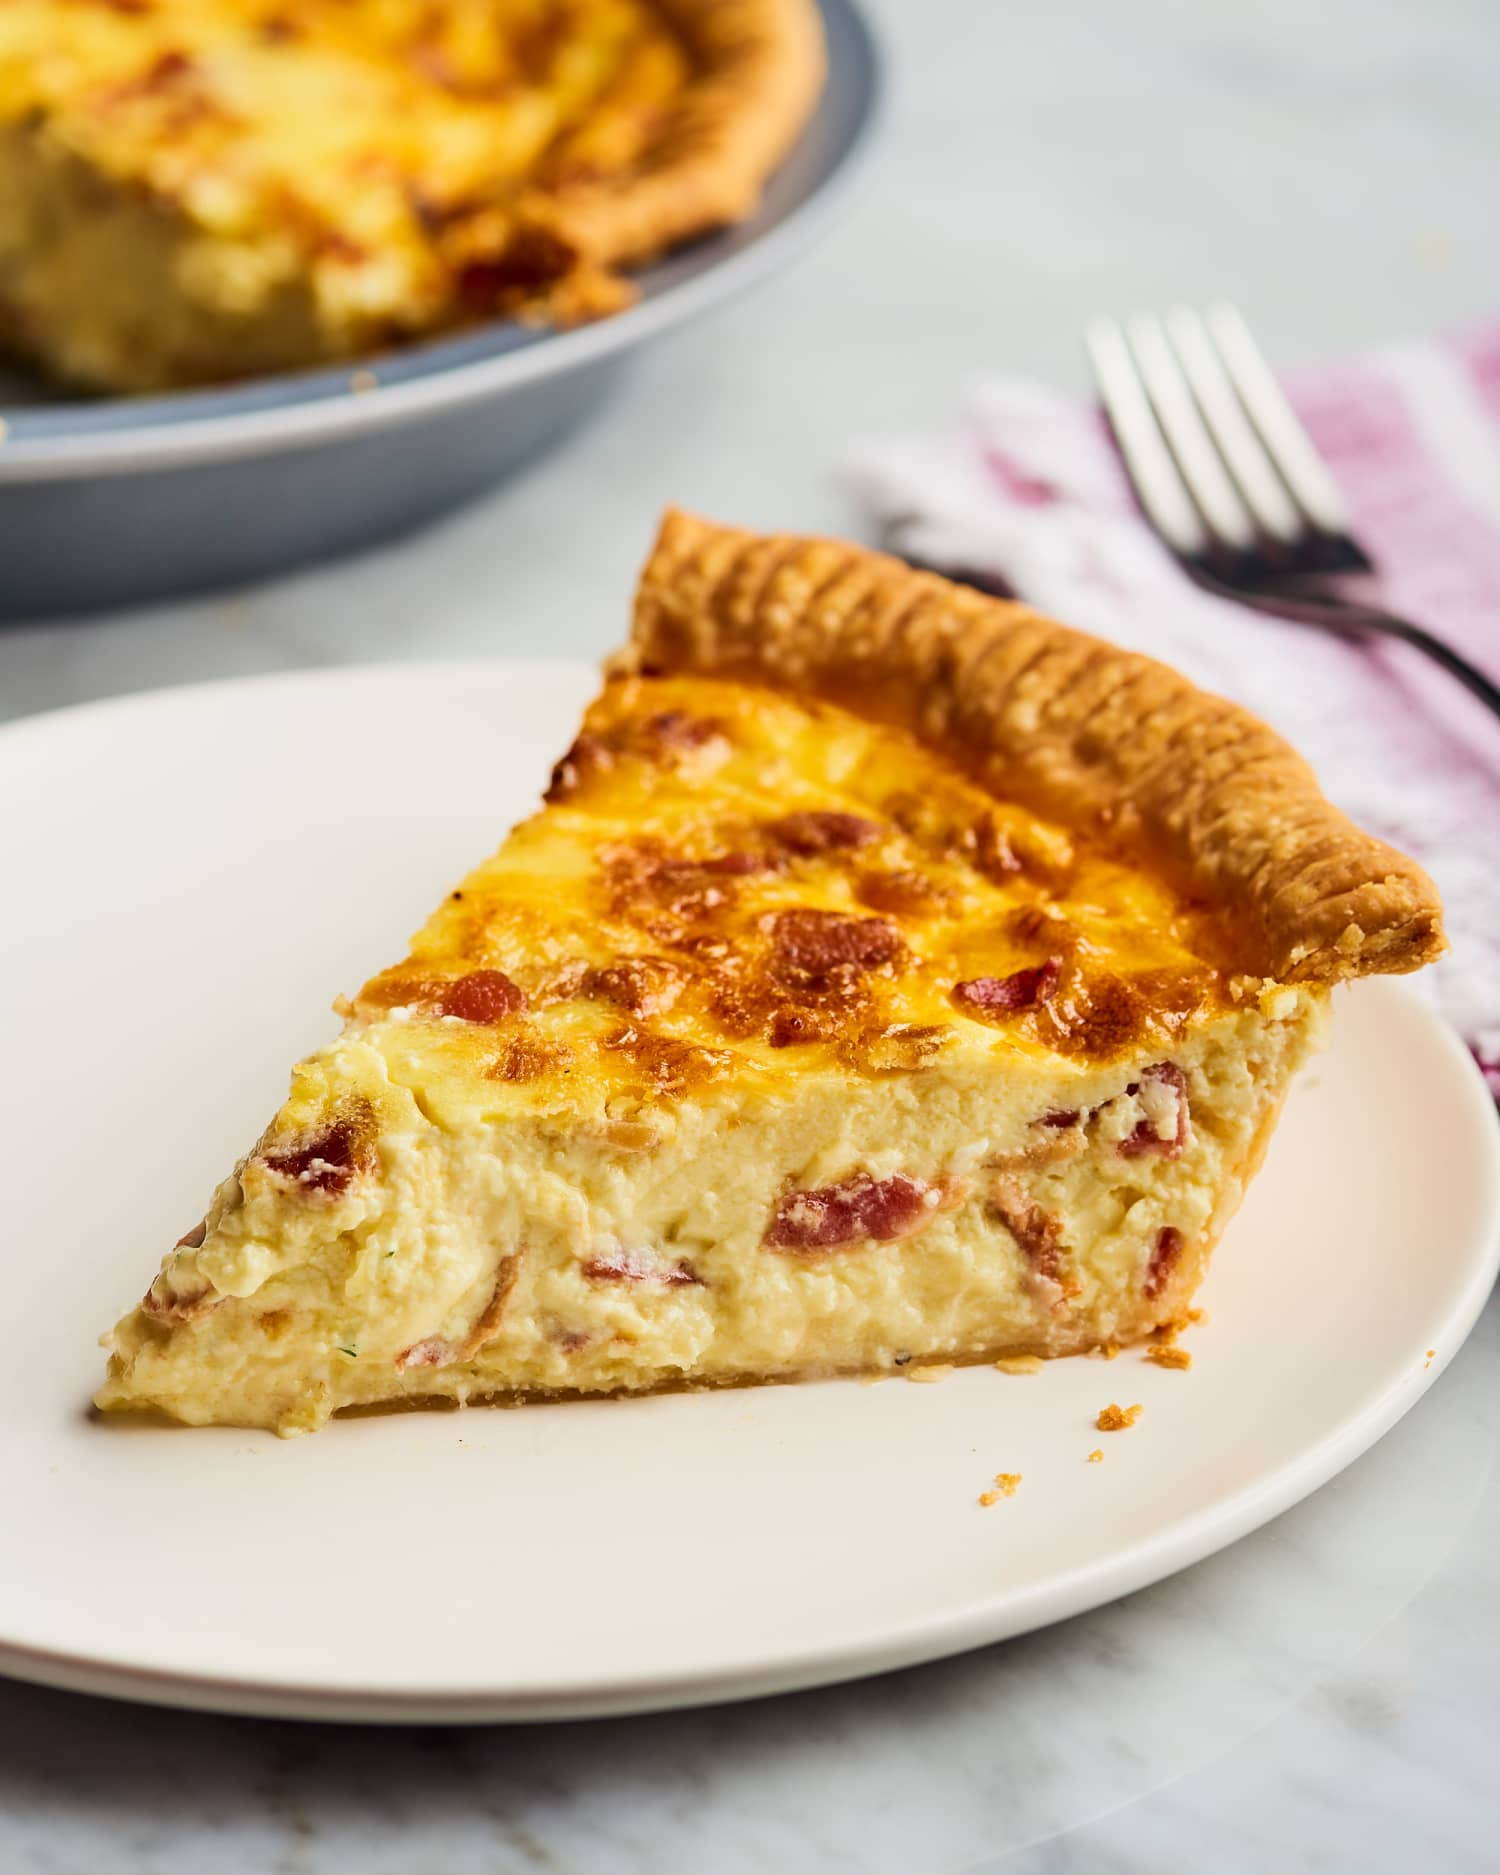 Recipe: Bacon and Cheese Breakfast Quiche